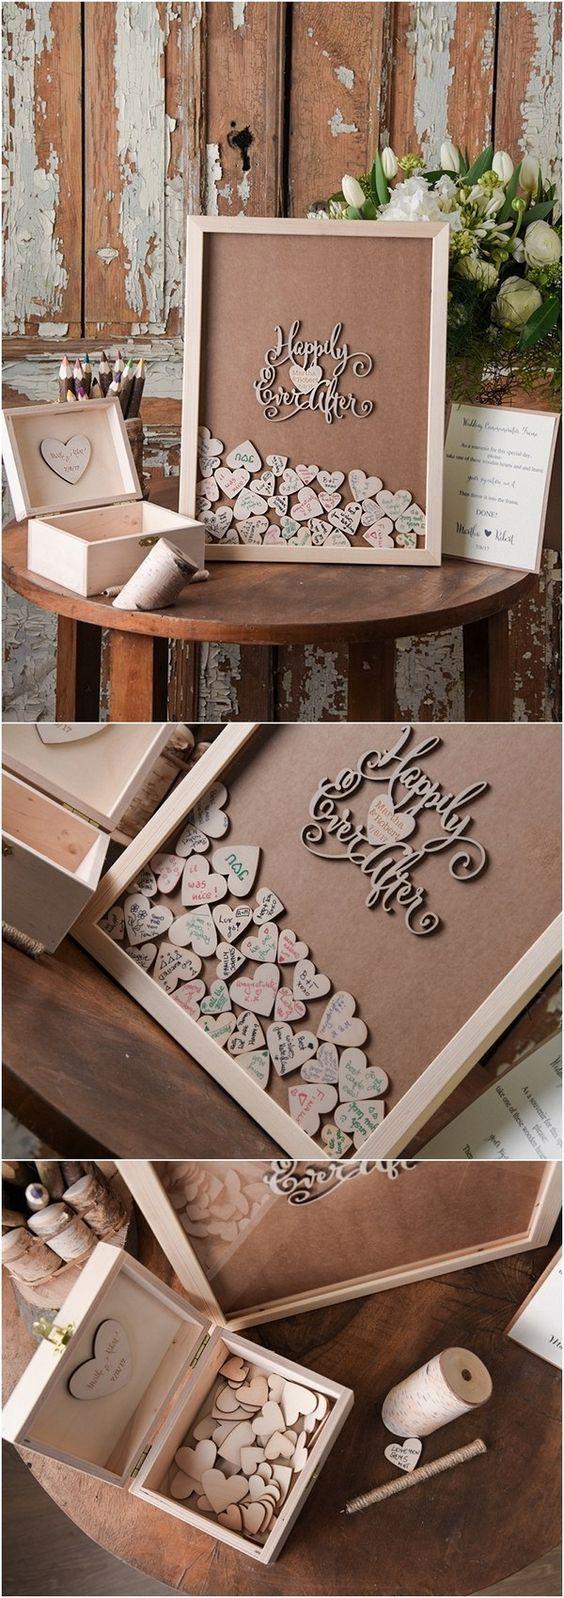 Rustic Laser Cut Wood Wedding Guest Book- Happy Ever After / http://www.deerpearlflowers.com/rustic-wedding-guest-books-botanical-wedding-invitations/